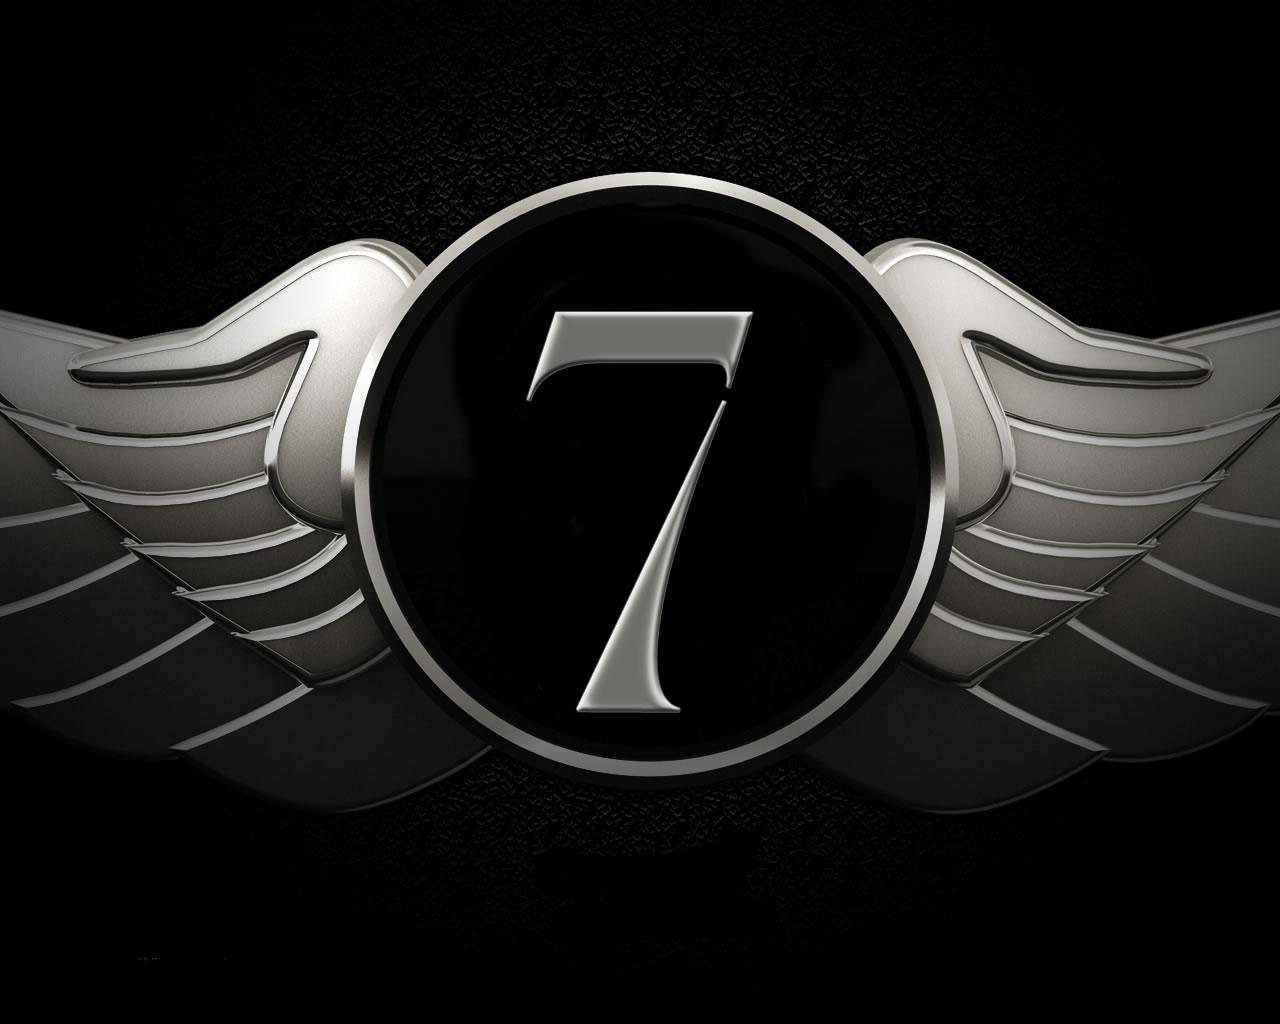 7, yedi, seven